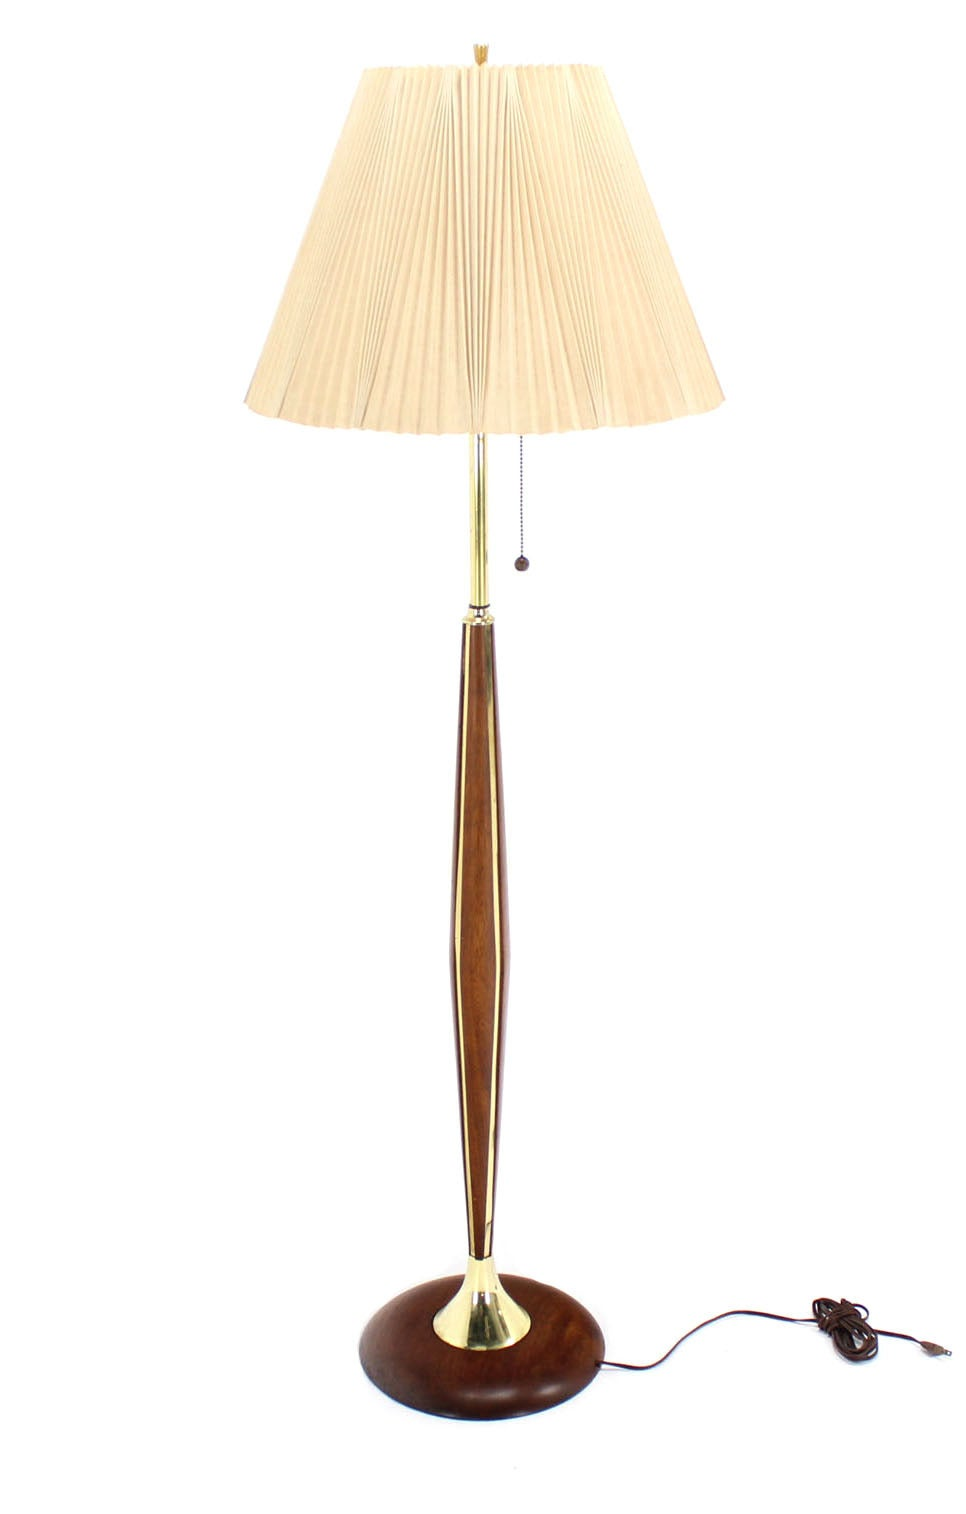 walnut and brass mid century modern floor lamp for sale at 1stdibs. Black Bedroom Furniture Sets. Home Design Ideas